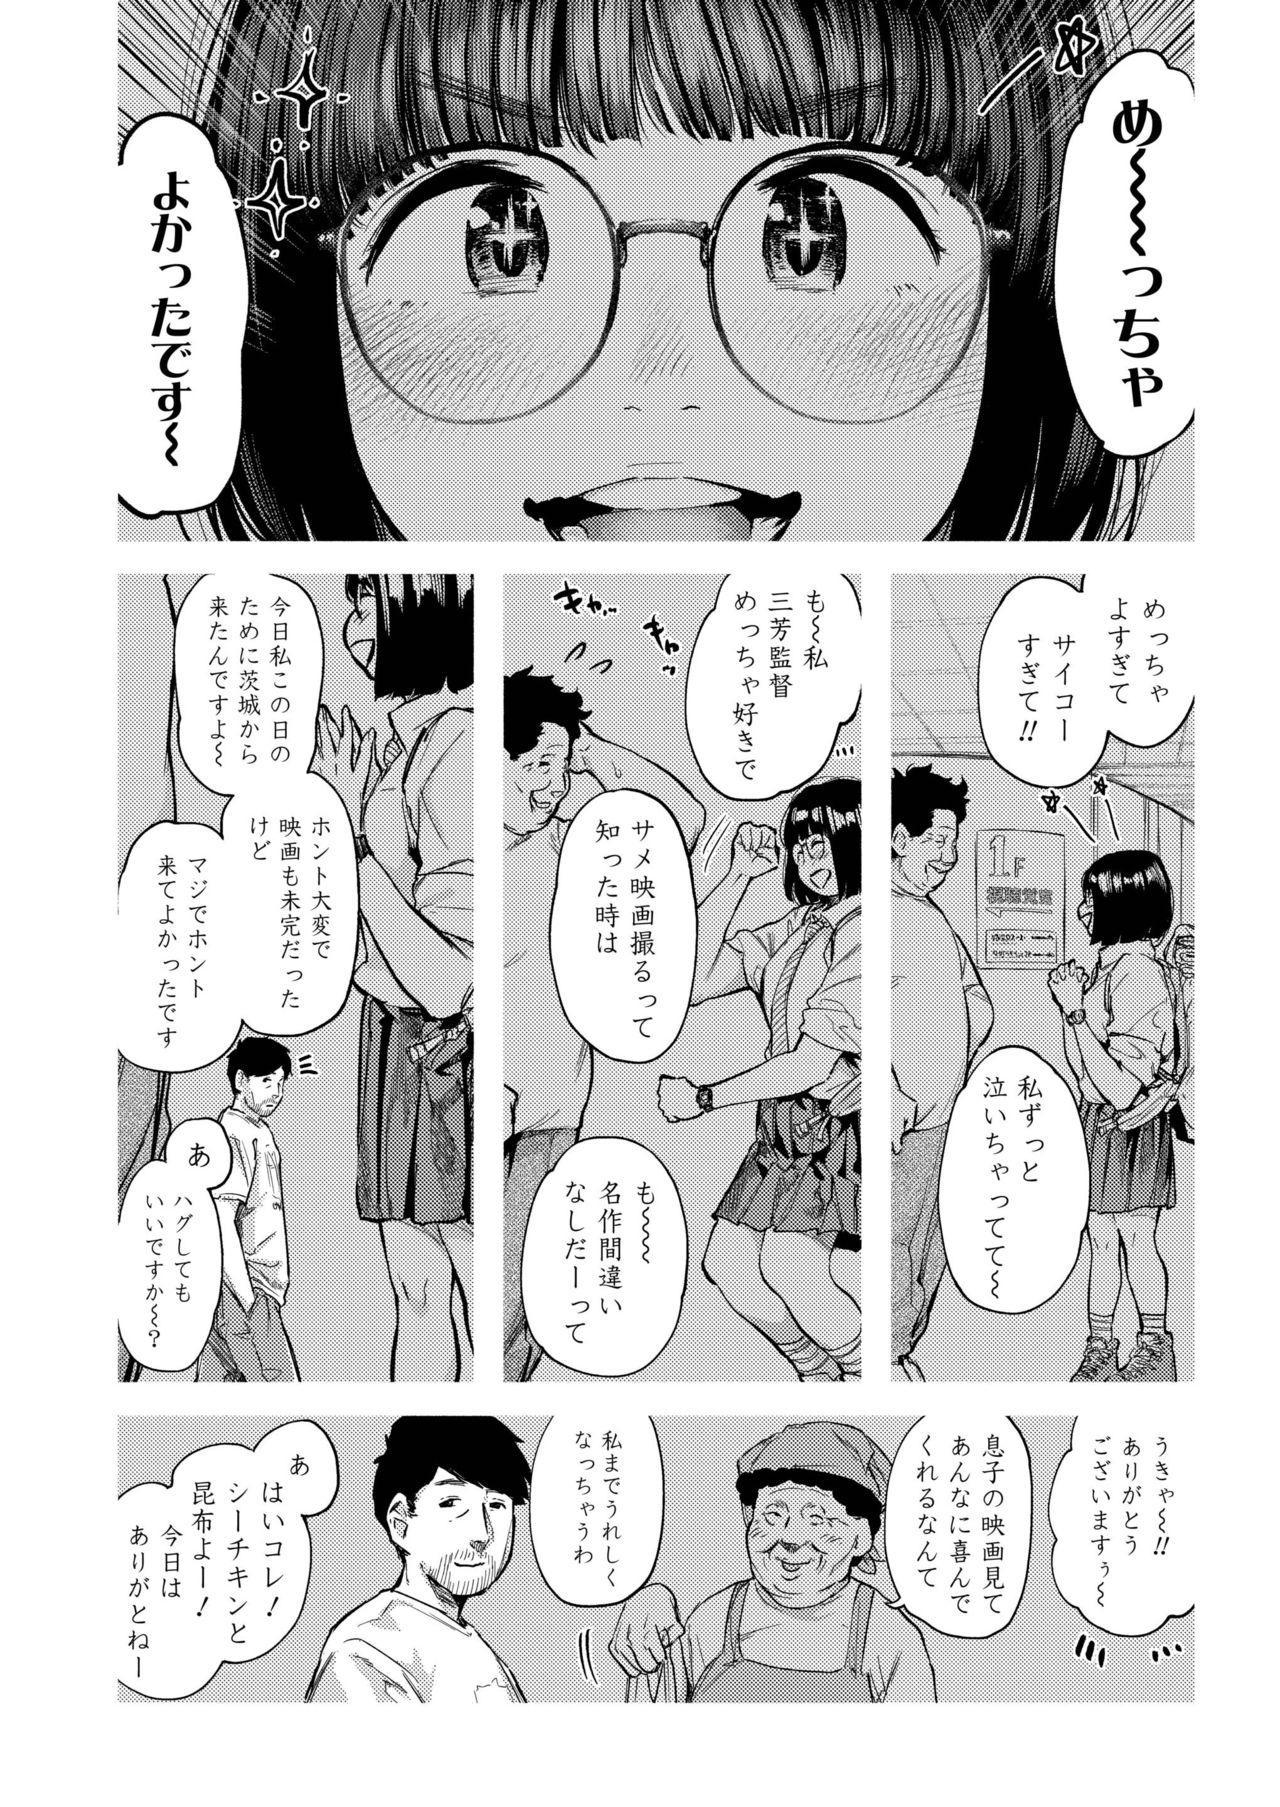 COMIC AOHA 2019 Haru 273